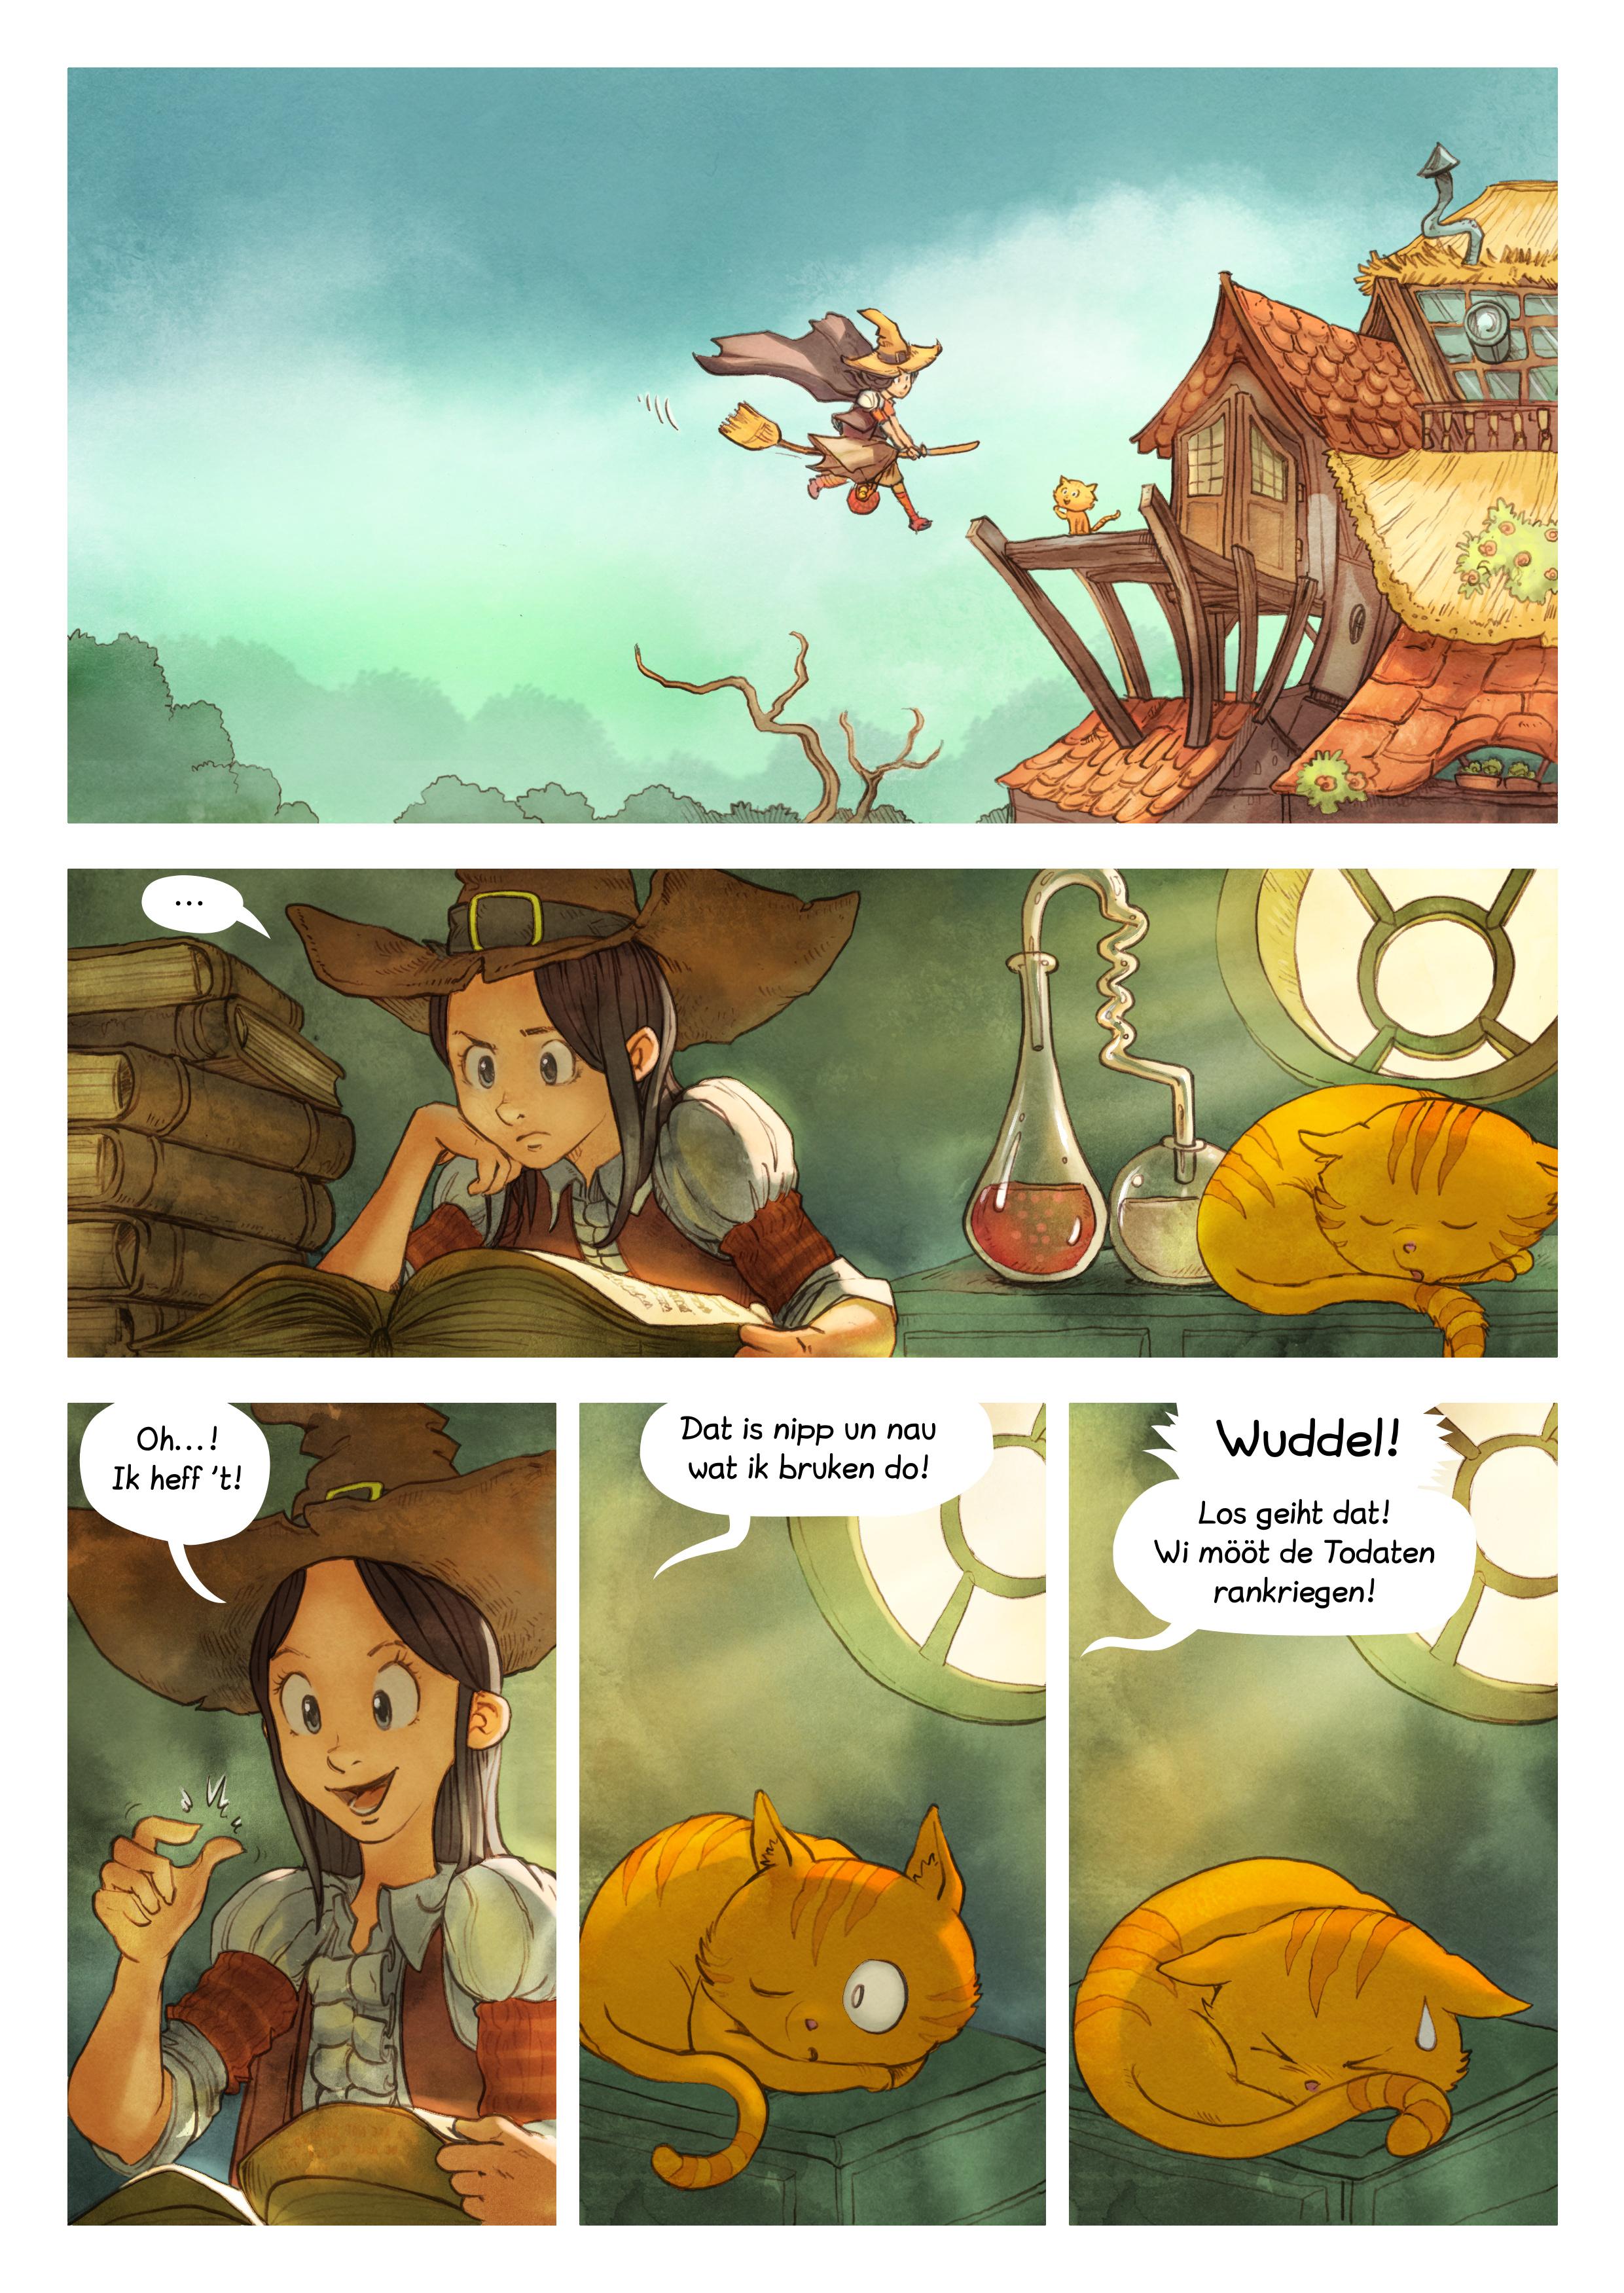 Folg 3: De gehemen Todaten, Page 4